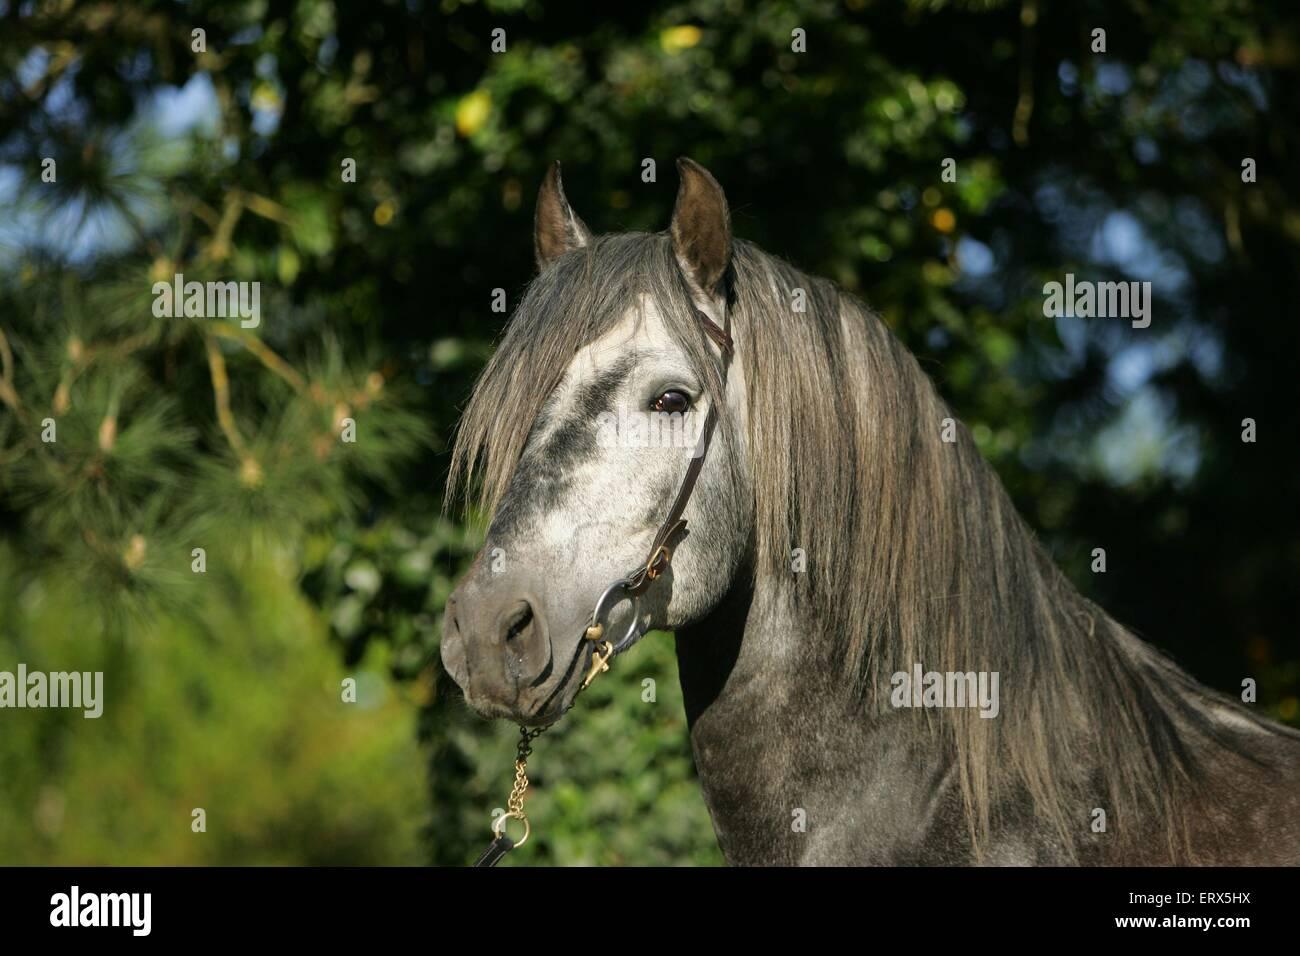 Pura Raza Espanola stallion - Stock Image